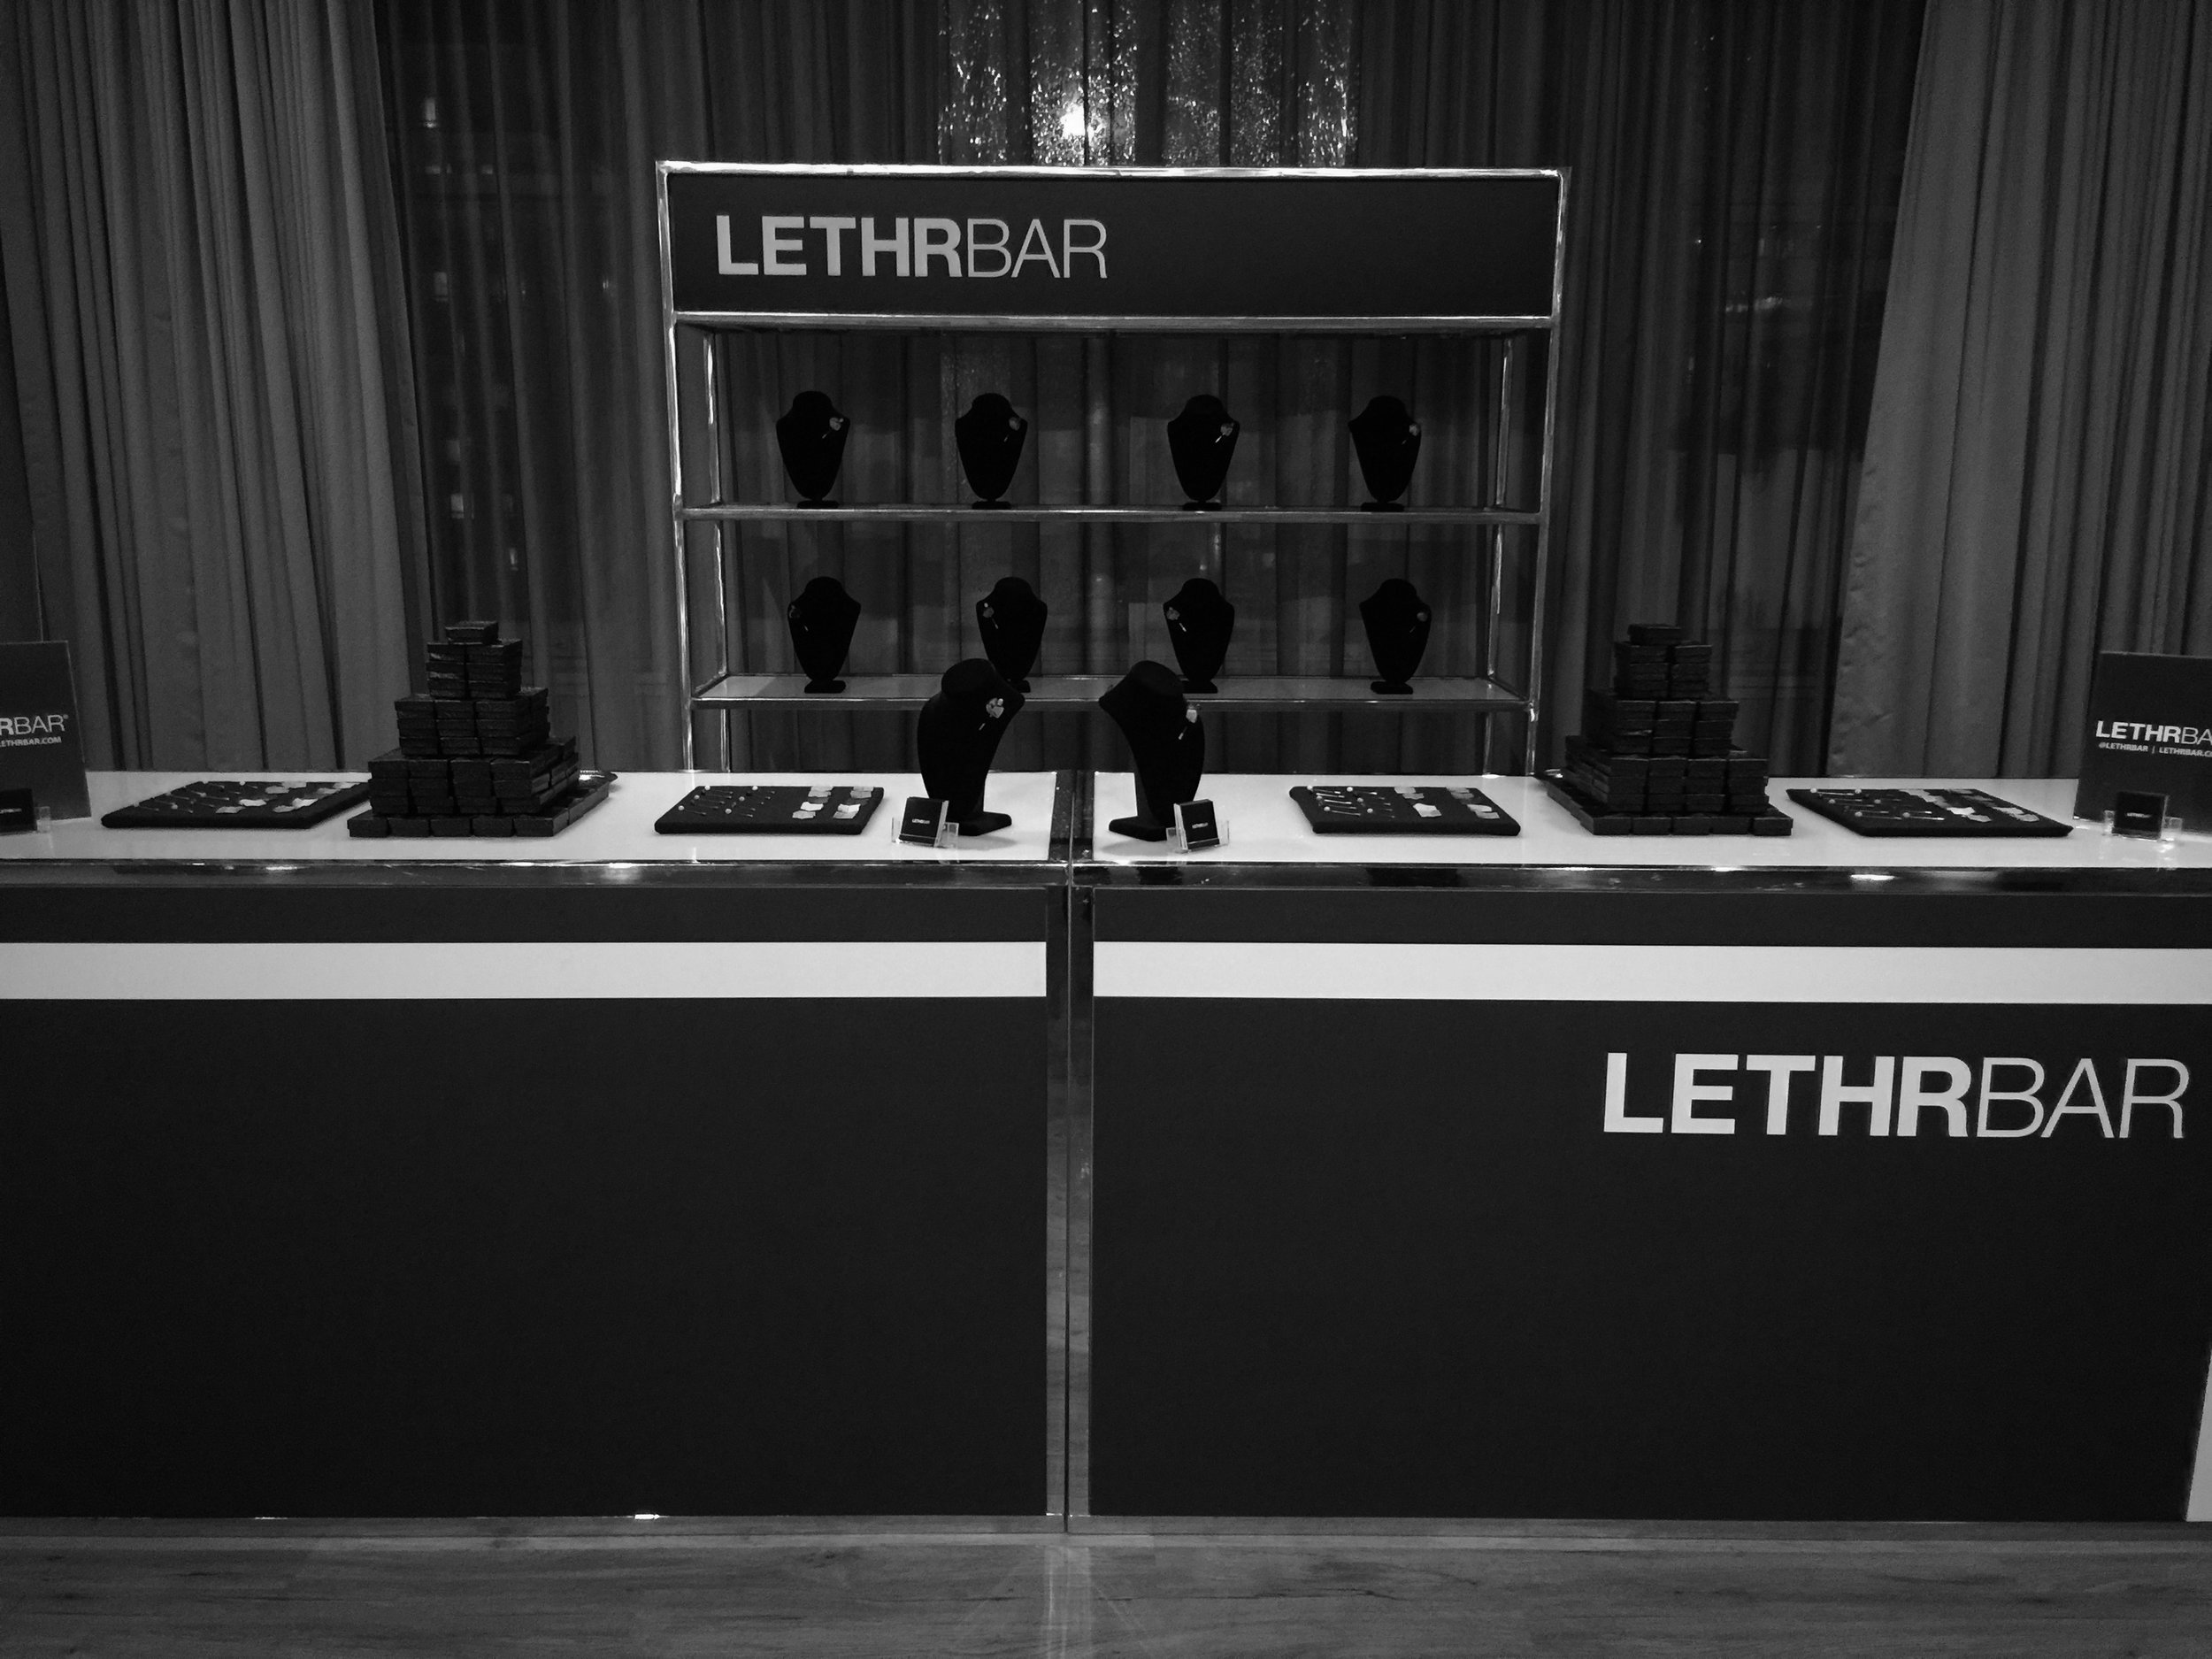 LETHRBAR Kat Marks 1.0 .jpg